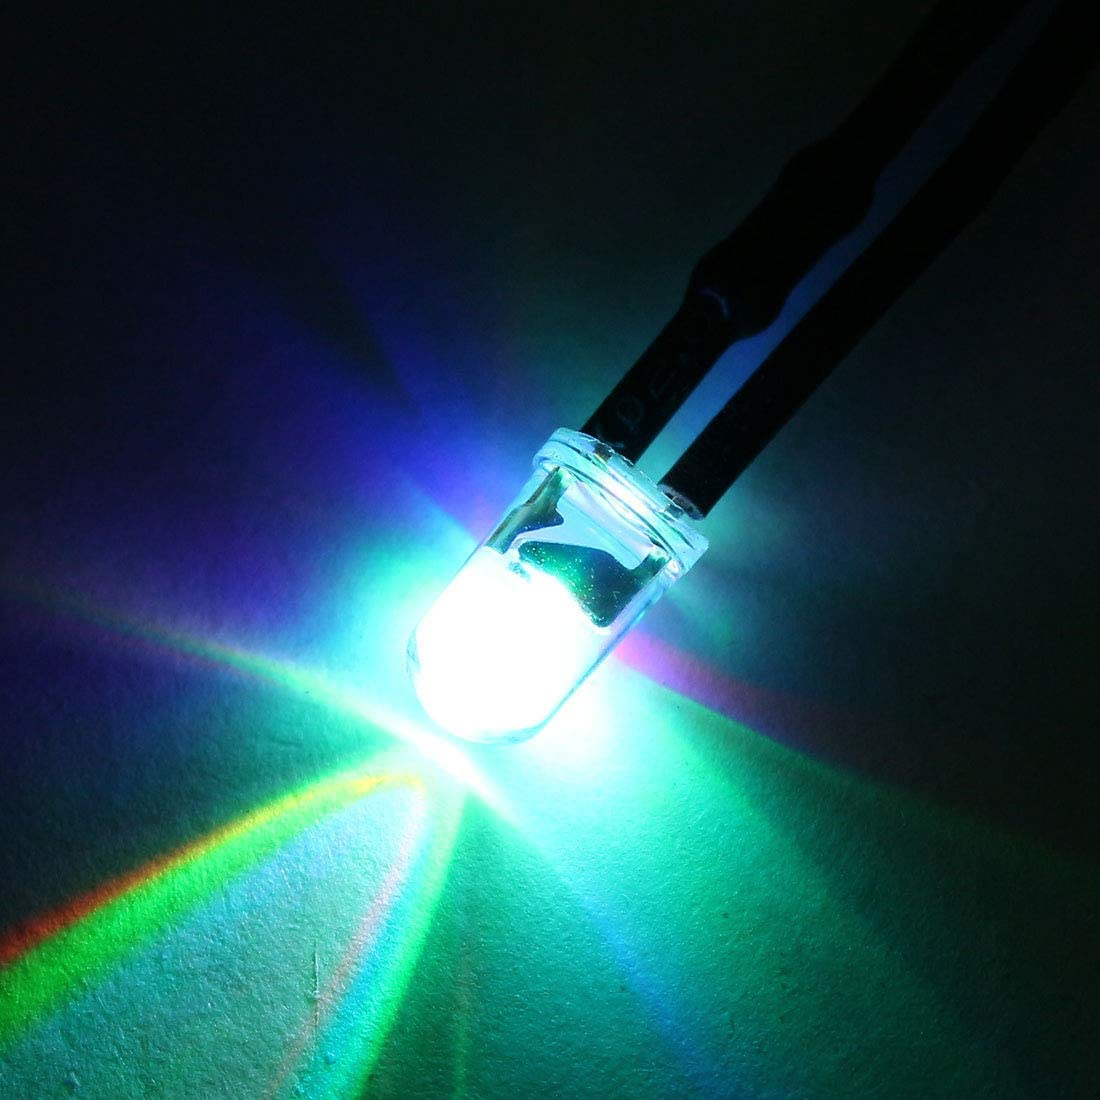 10Pcs 5mm pre-wired LED slow flashing DC24V transparent lens light emitting diodes